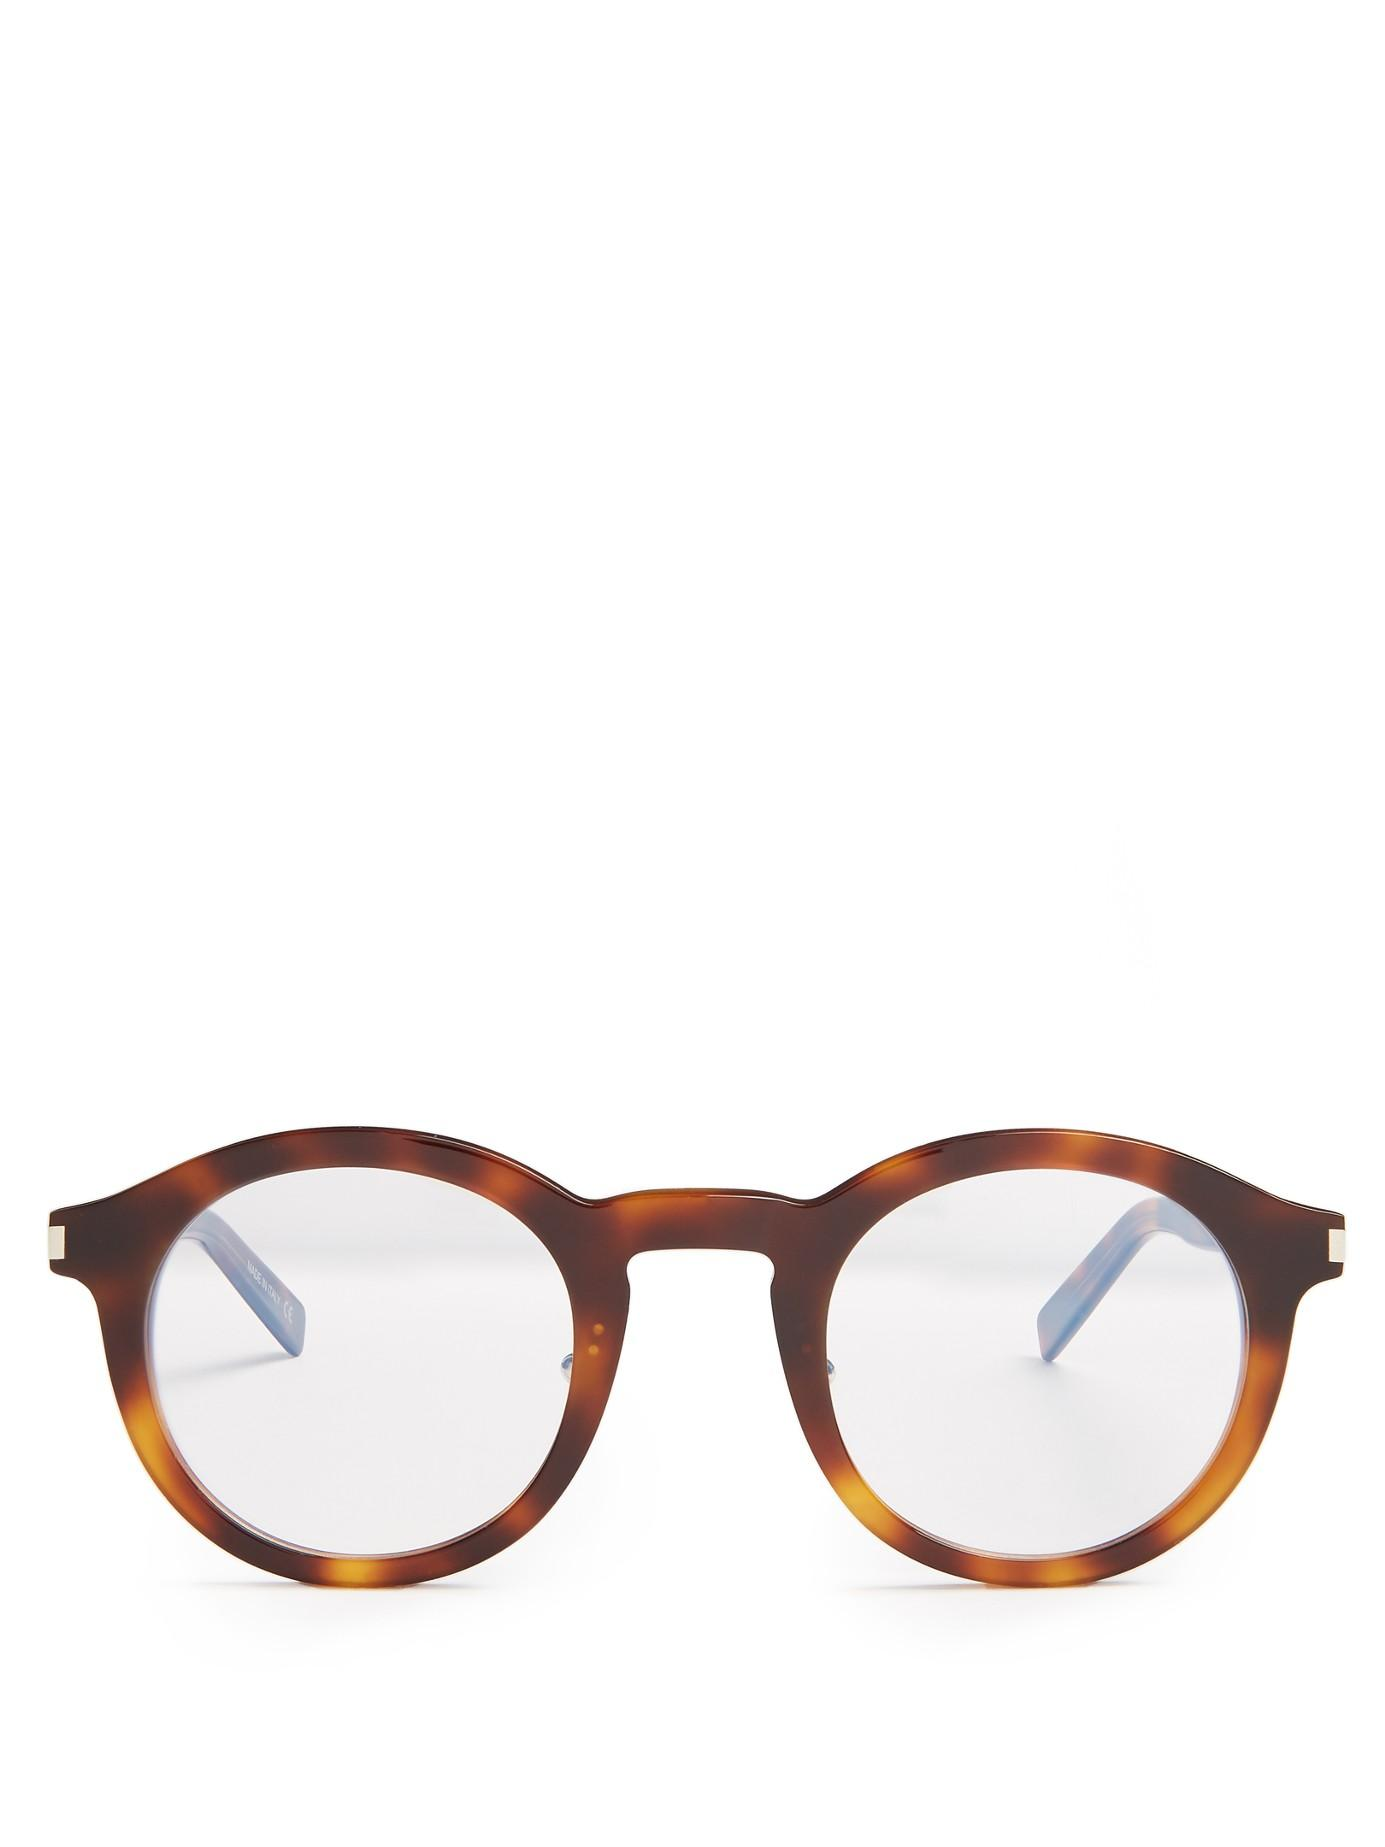 Acetate In Glasses Frame : Saint laurent Round-frame Acetate Glasses Lyst